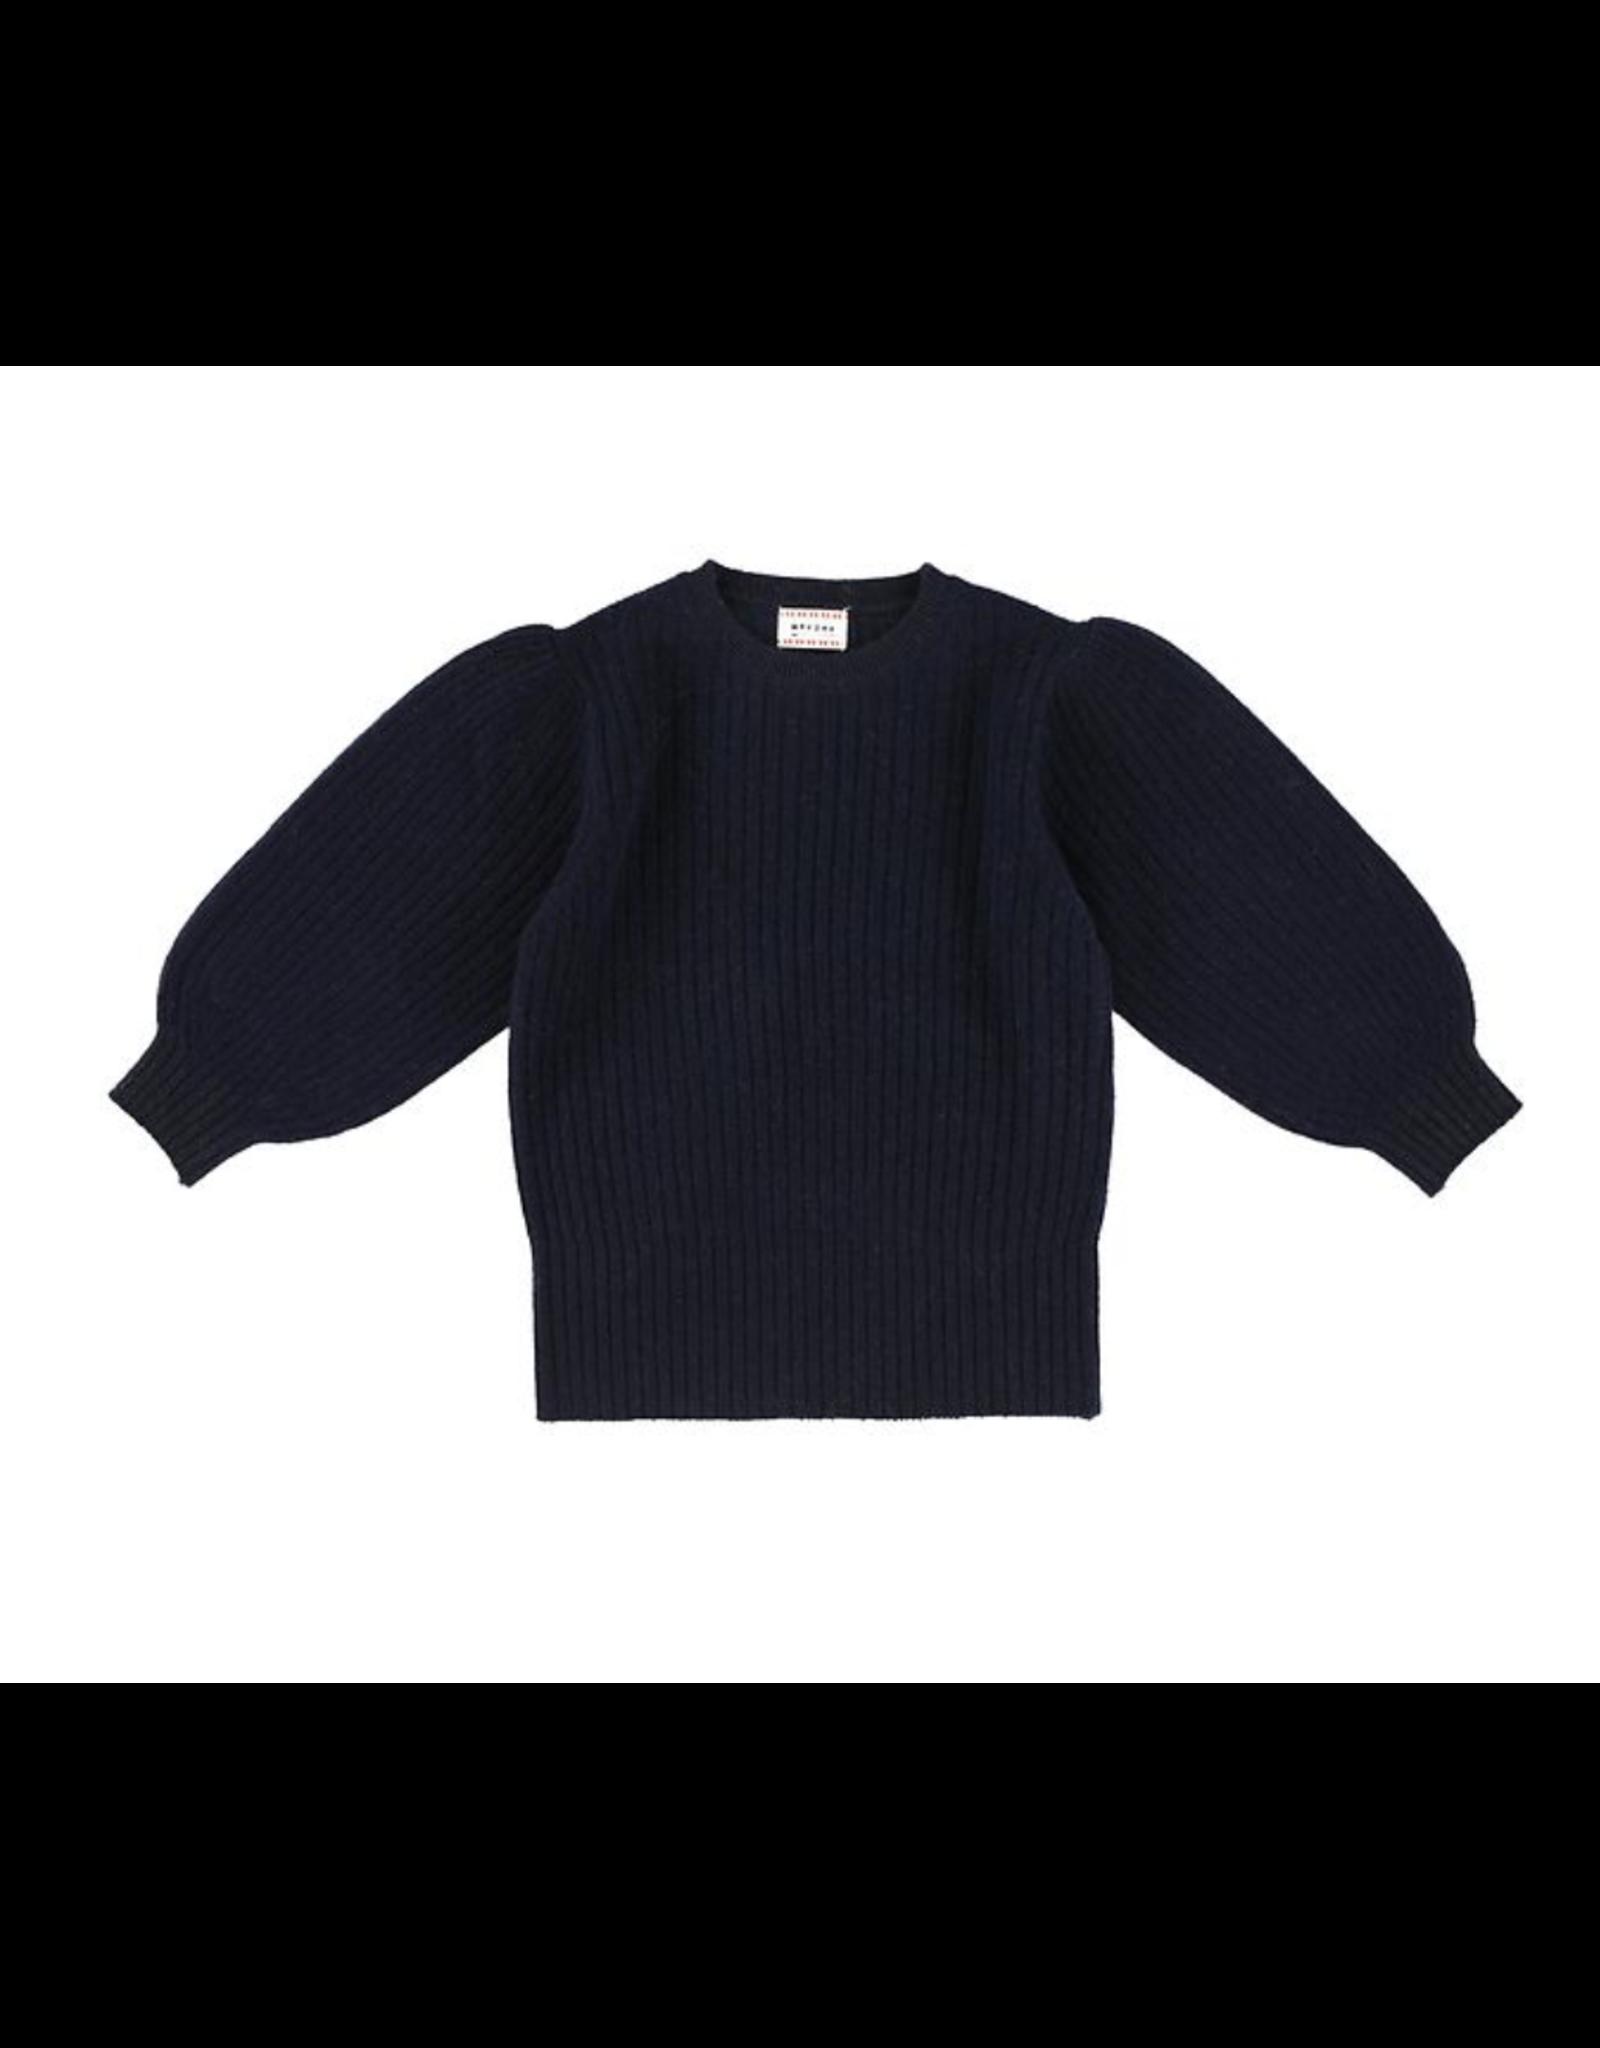 Morley Oriana wool navy pull